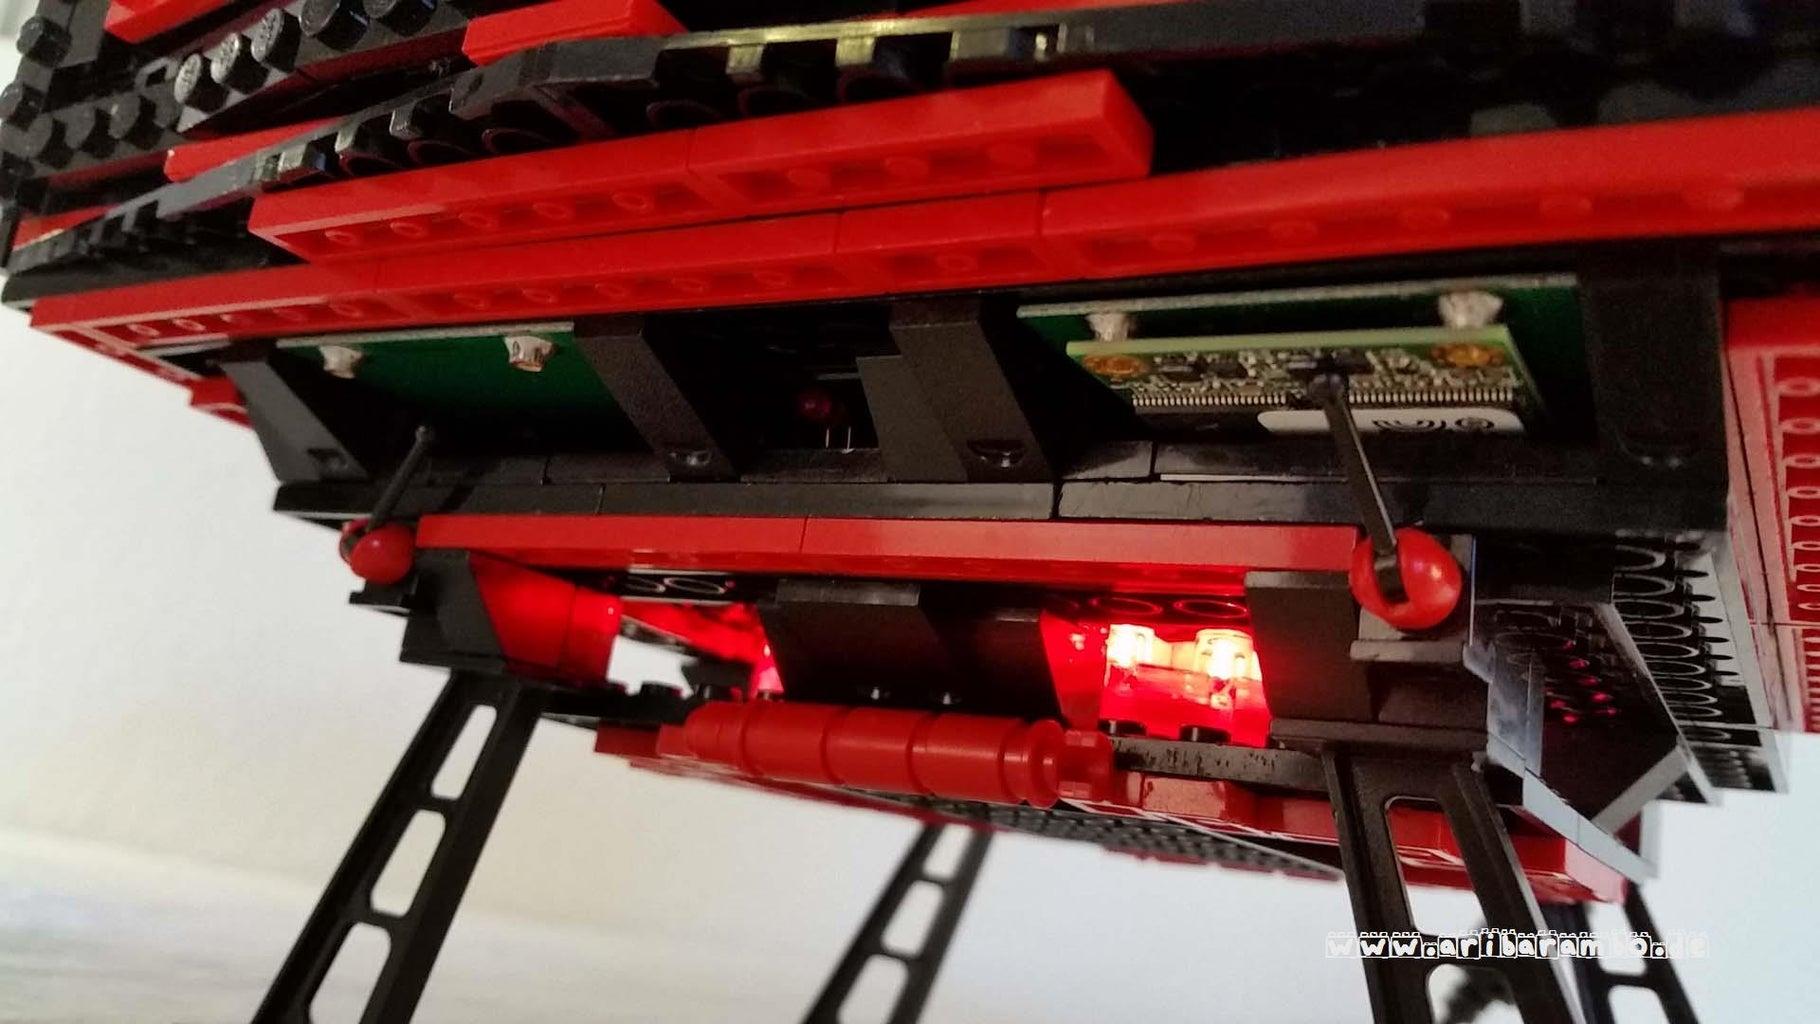 LEGO Mod - a LEGO PC/Computer/Casemod